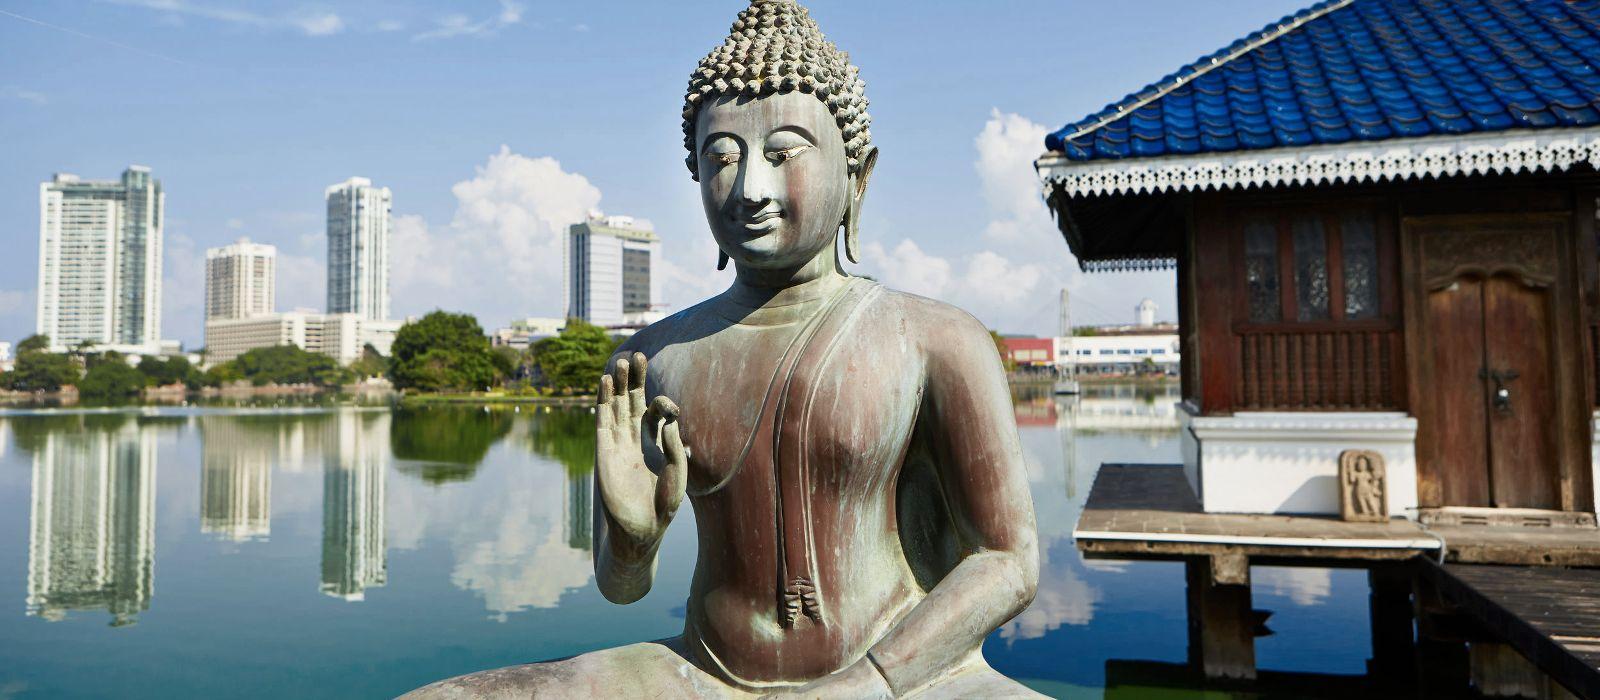 Signature of Sri Lanka Tour Trip 7